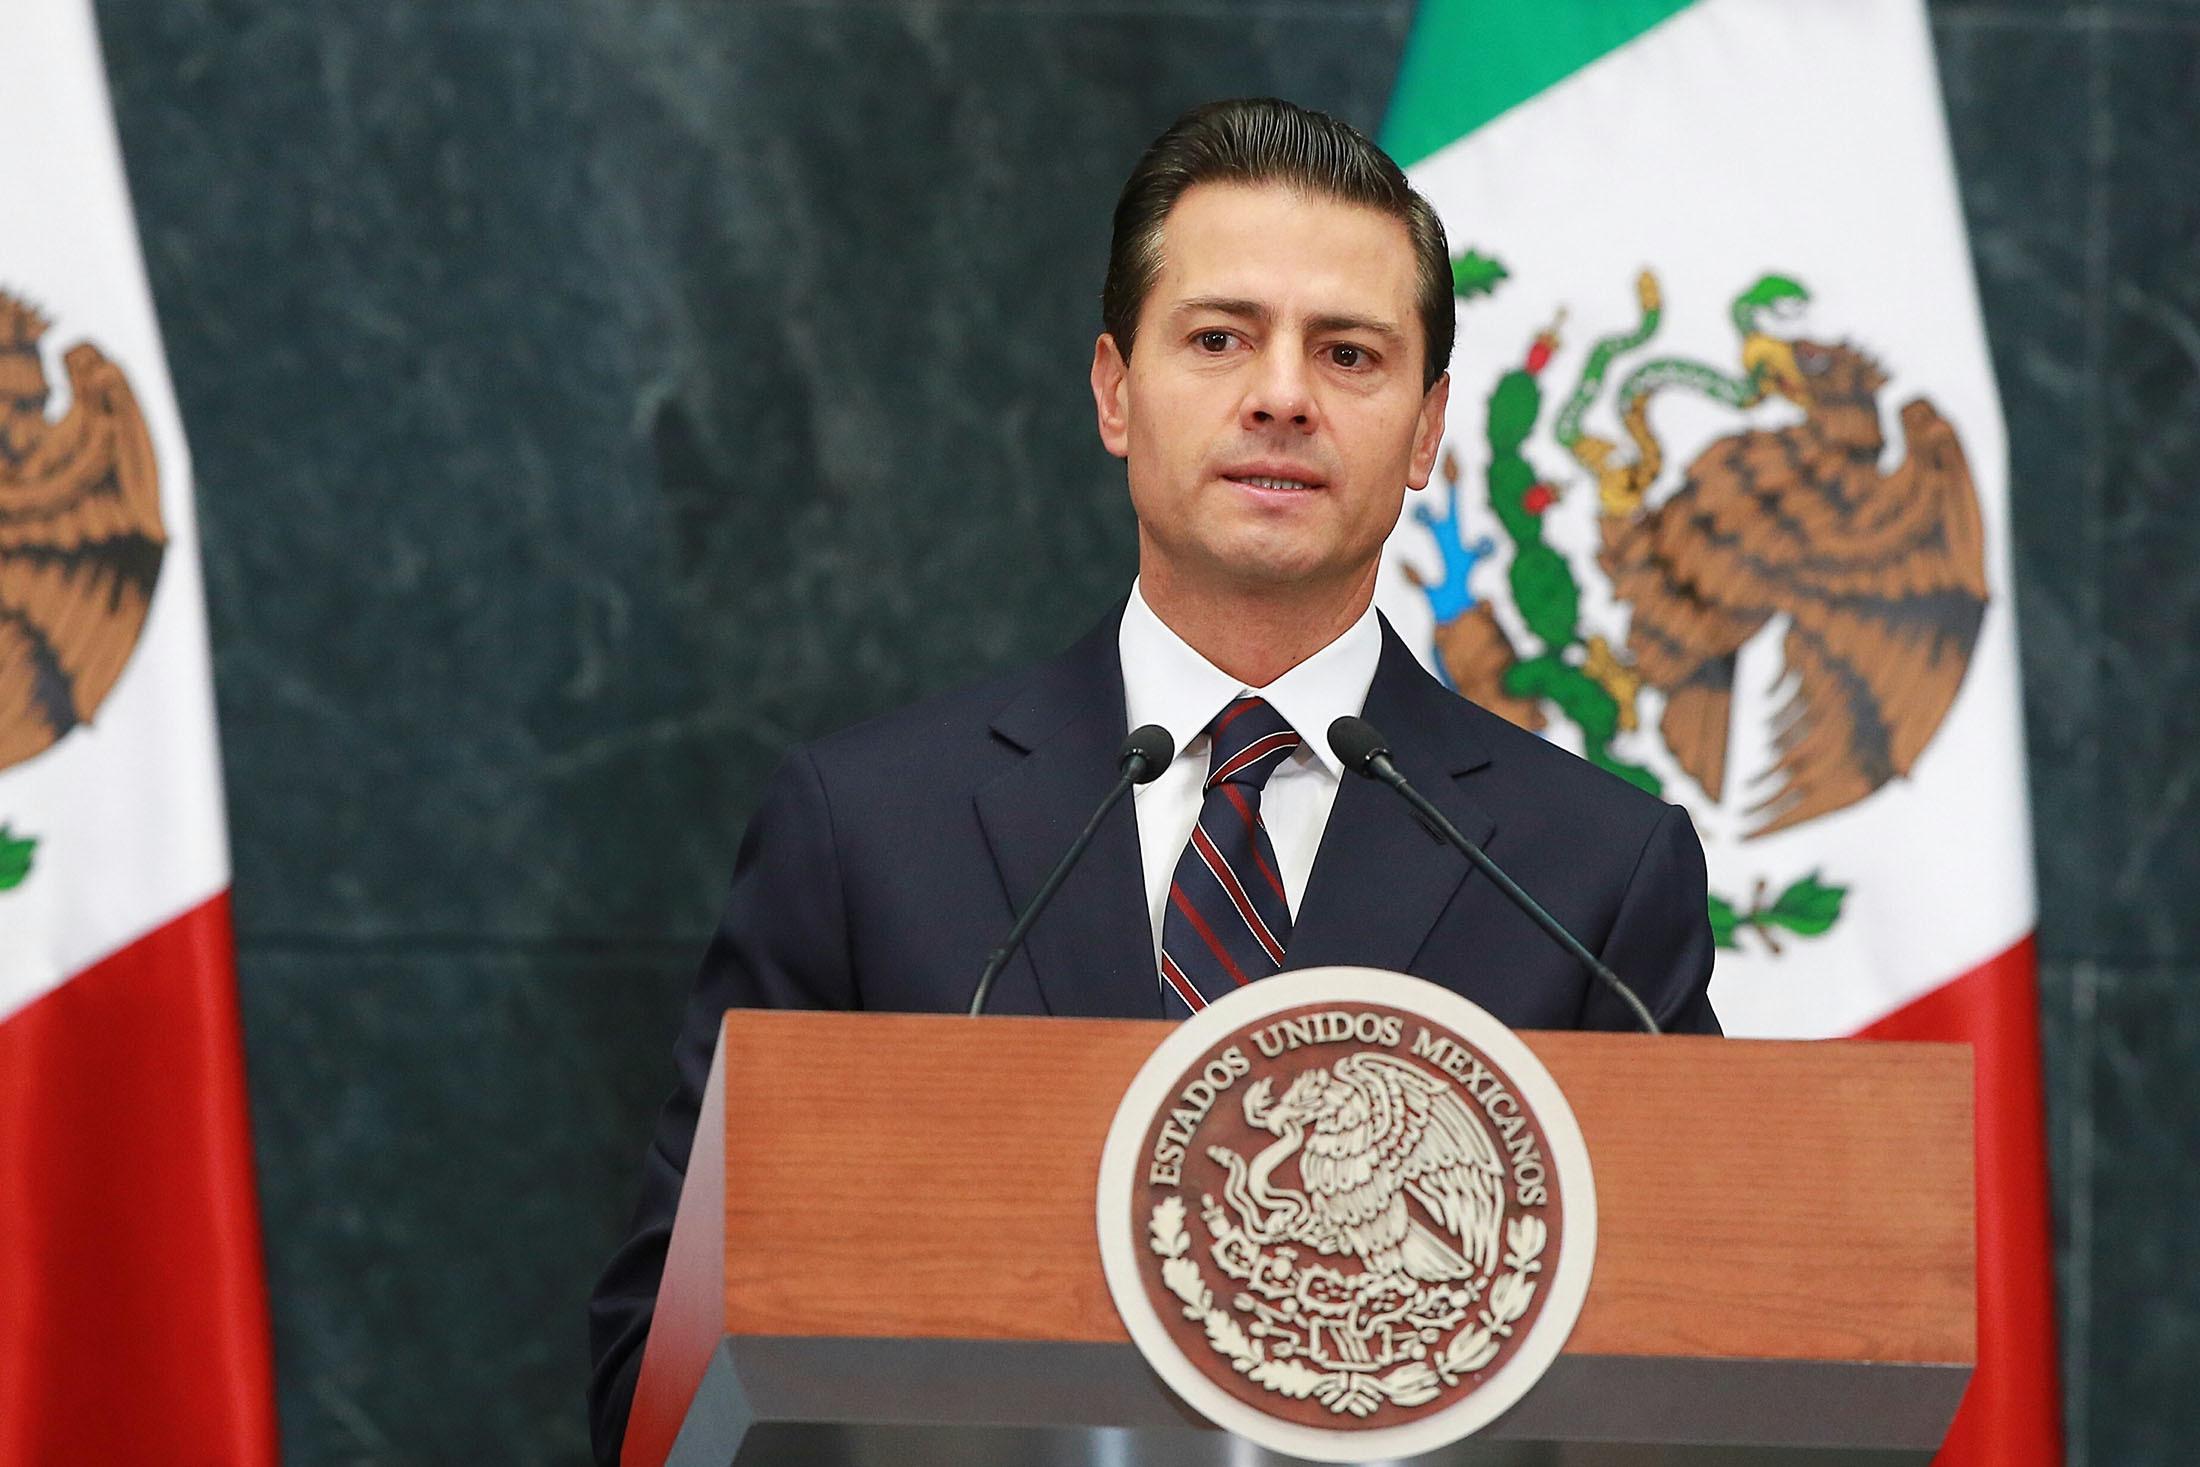 Enrique Pena Nieto Photographer: Susana Gonzalez/Bloomberg